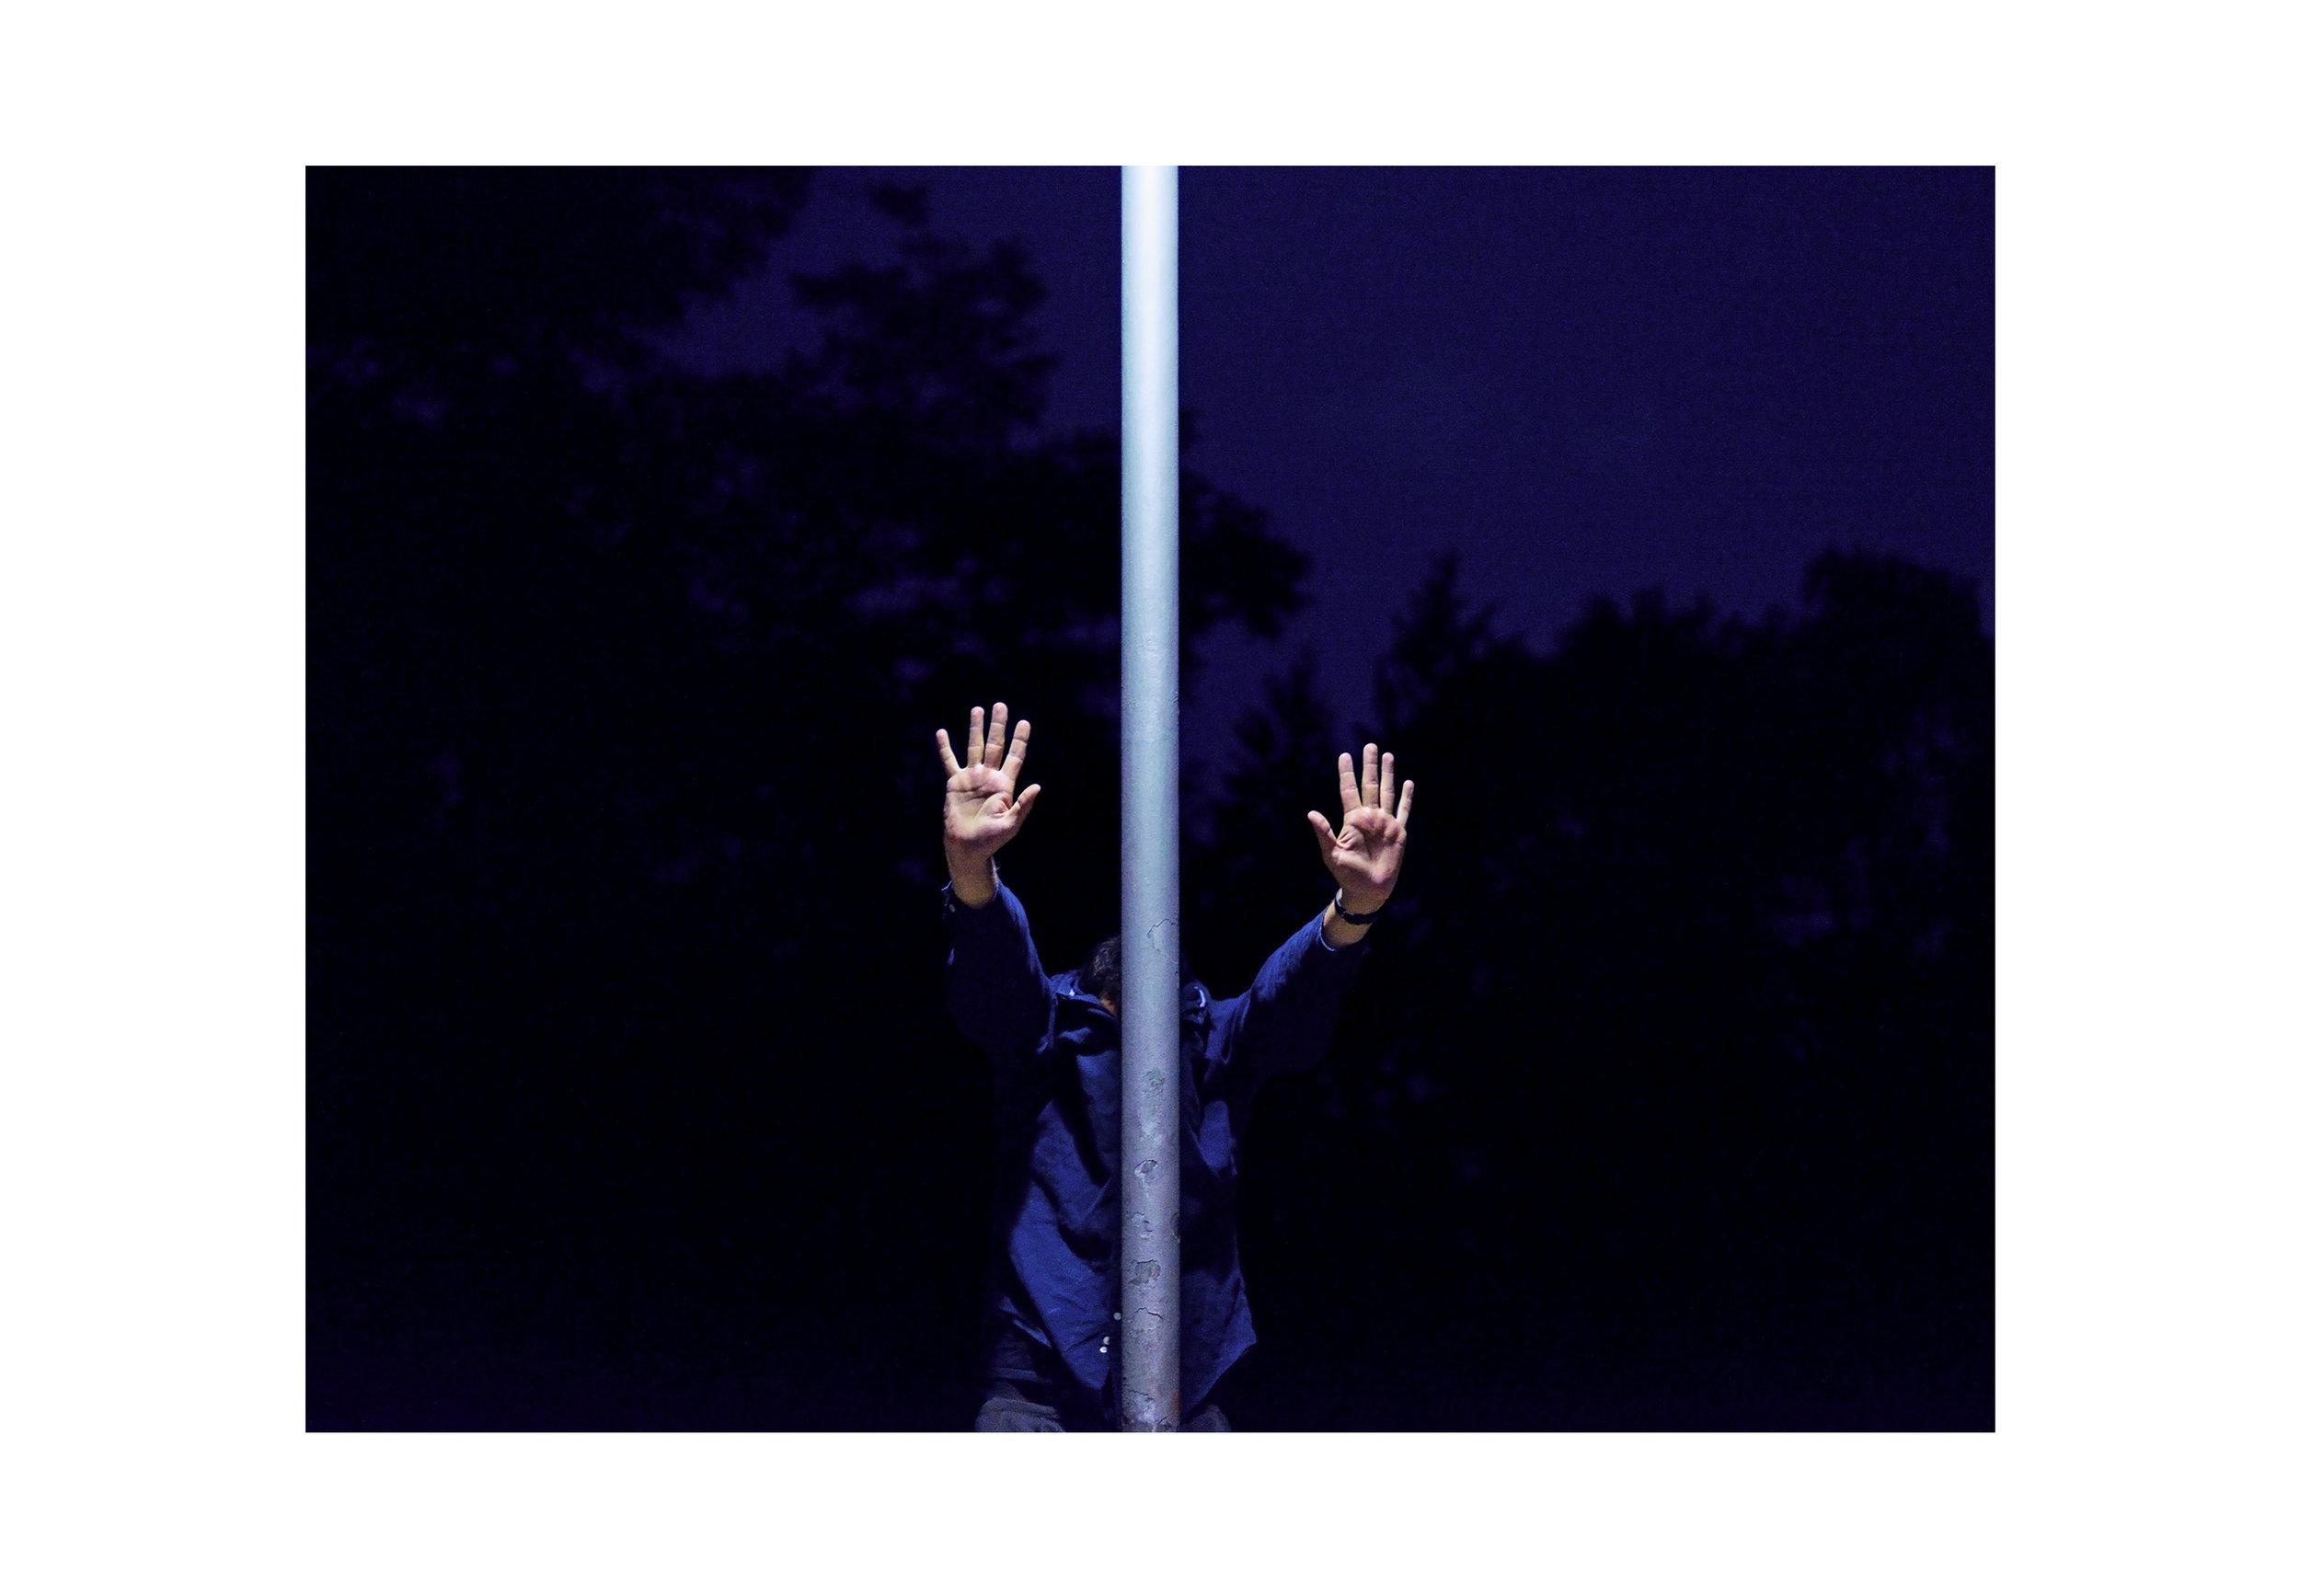 Marcel-Eichner-hands-pipe-hiding-Berlin-night-Matthew-Coleman-Photography.jpg